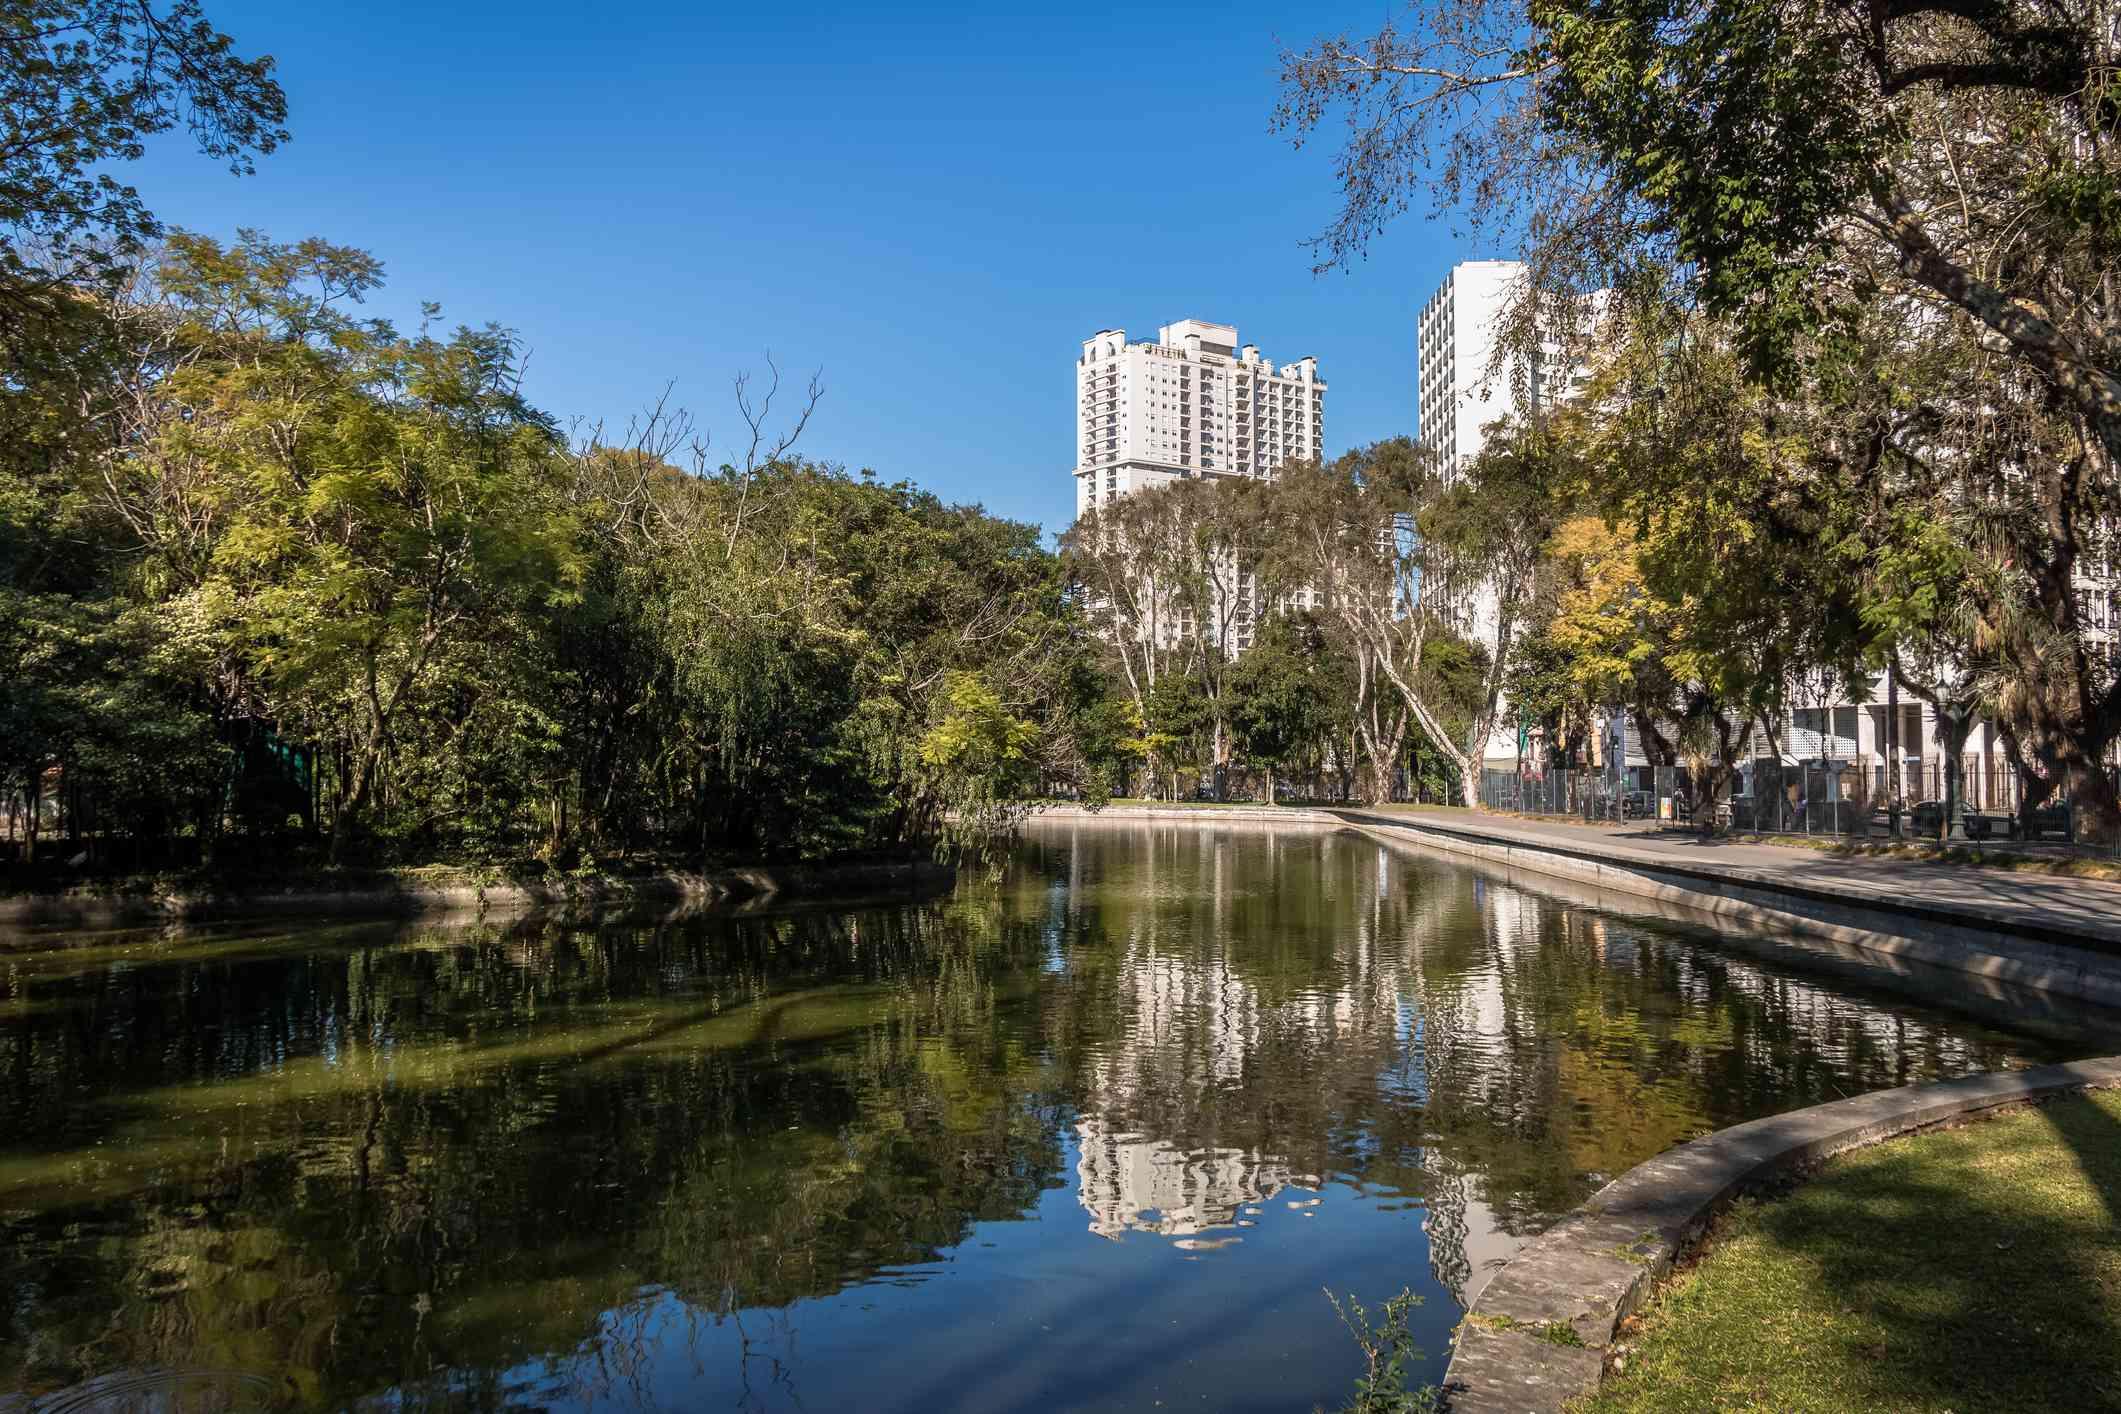 Parque Passeio Publico - Curitiba, Paraná, Brasil